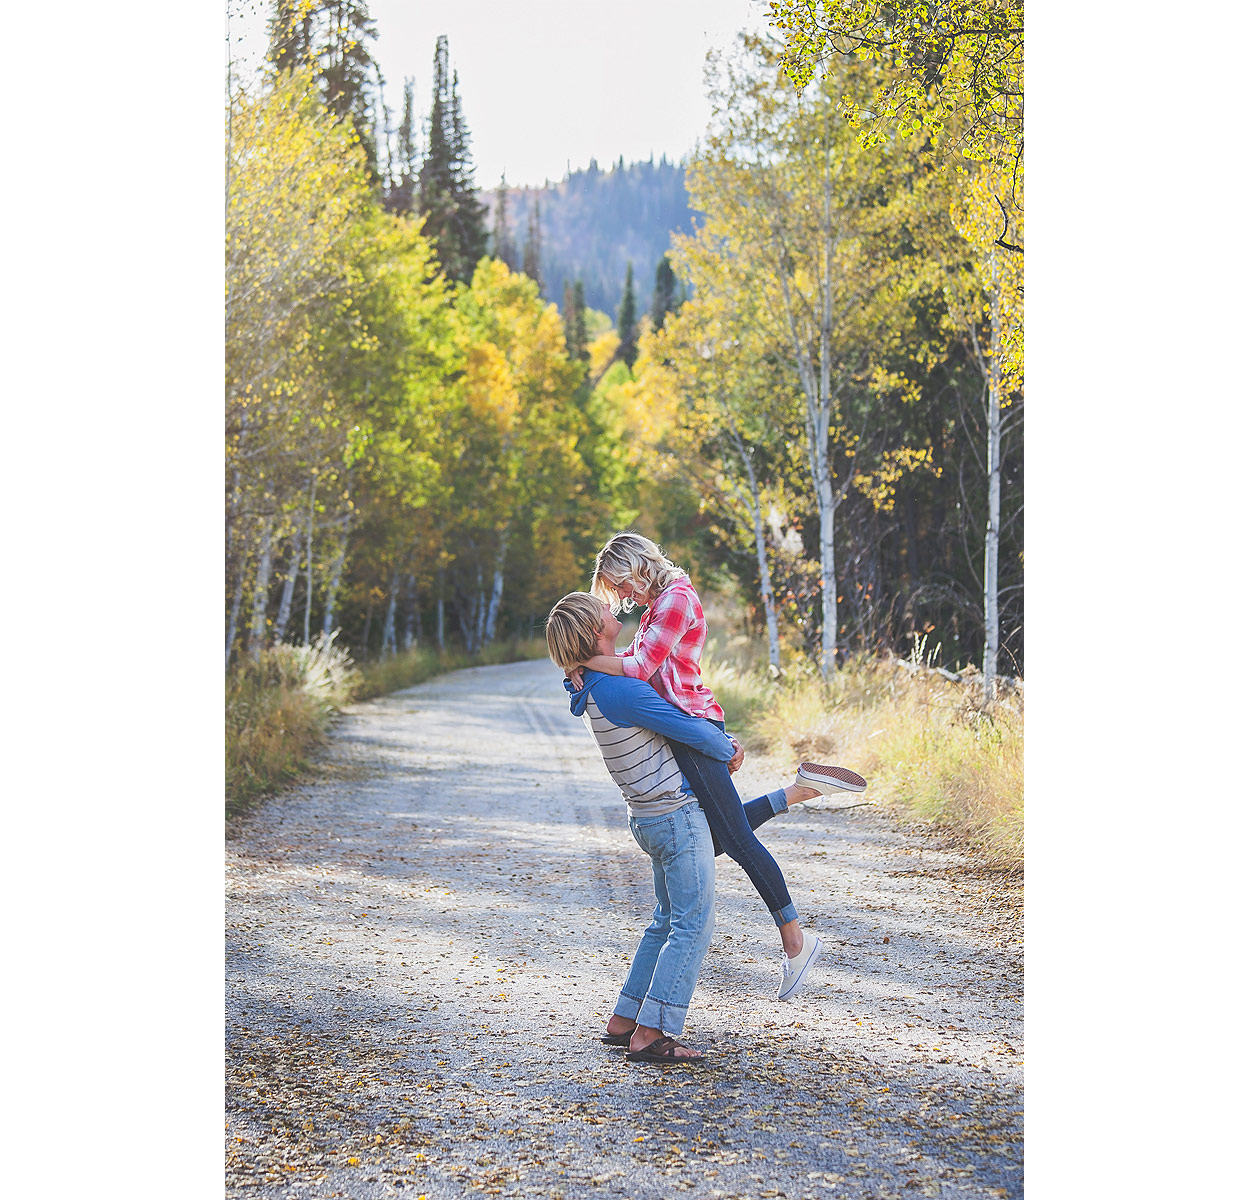 LoganUtahEngagementPhotography-TonyGroveEngagementPhotography-HeidiRandallStudios-Courtney+Sam-3.jpg